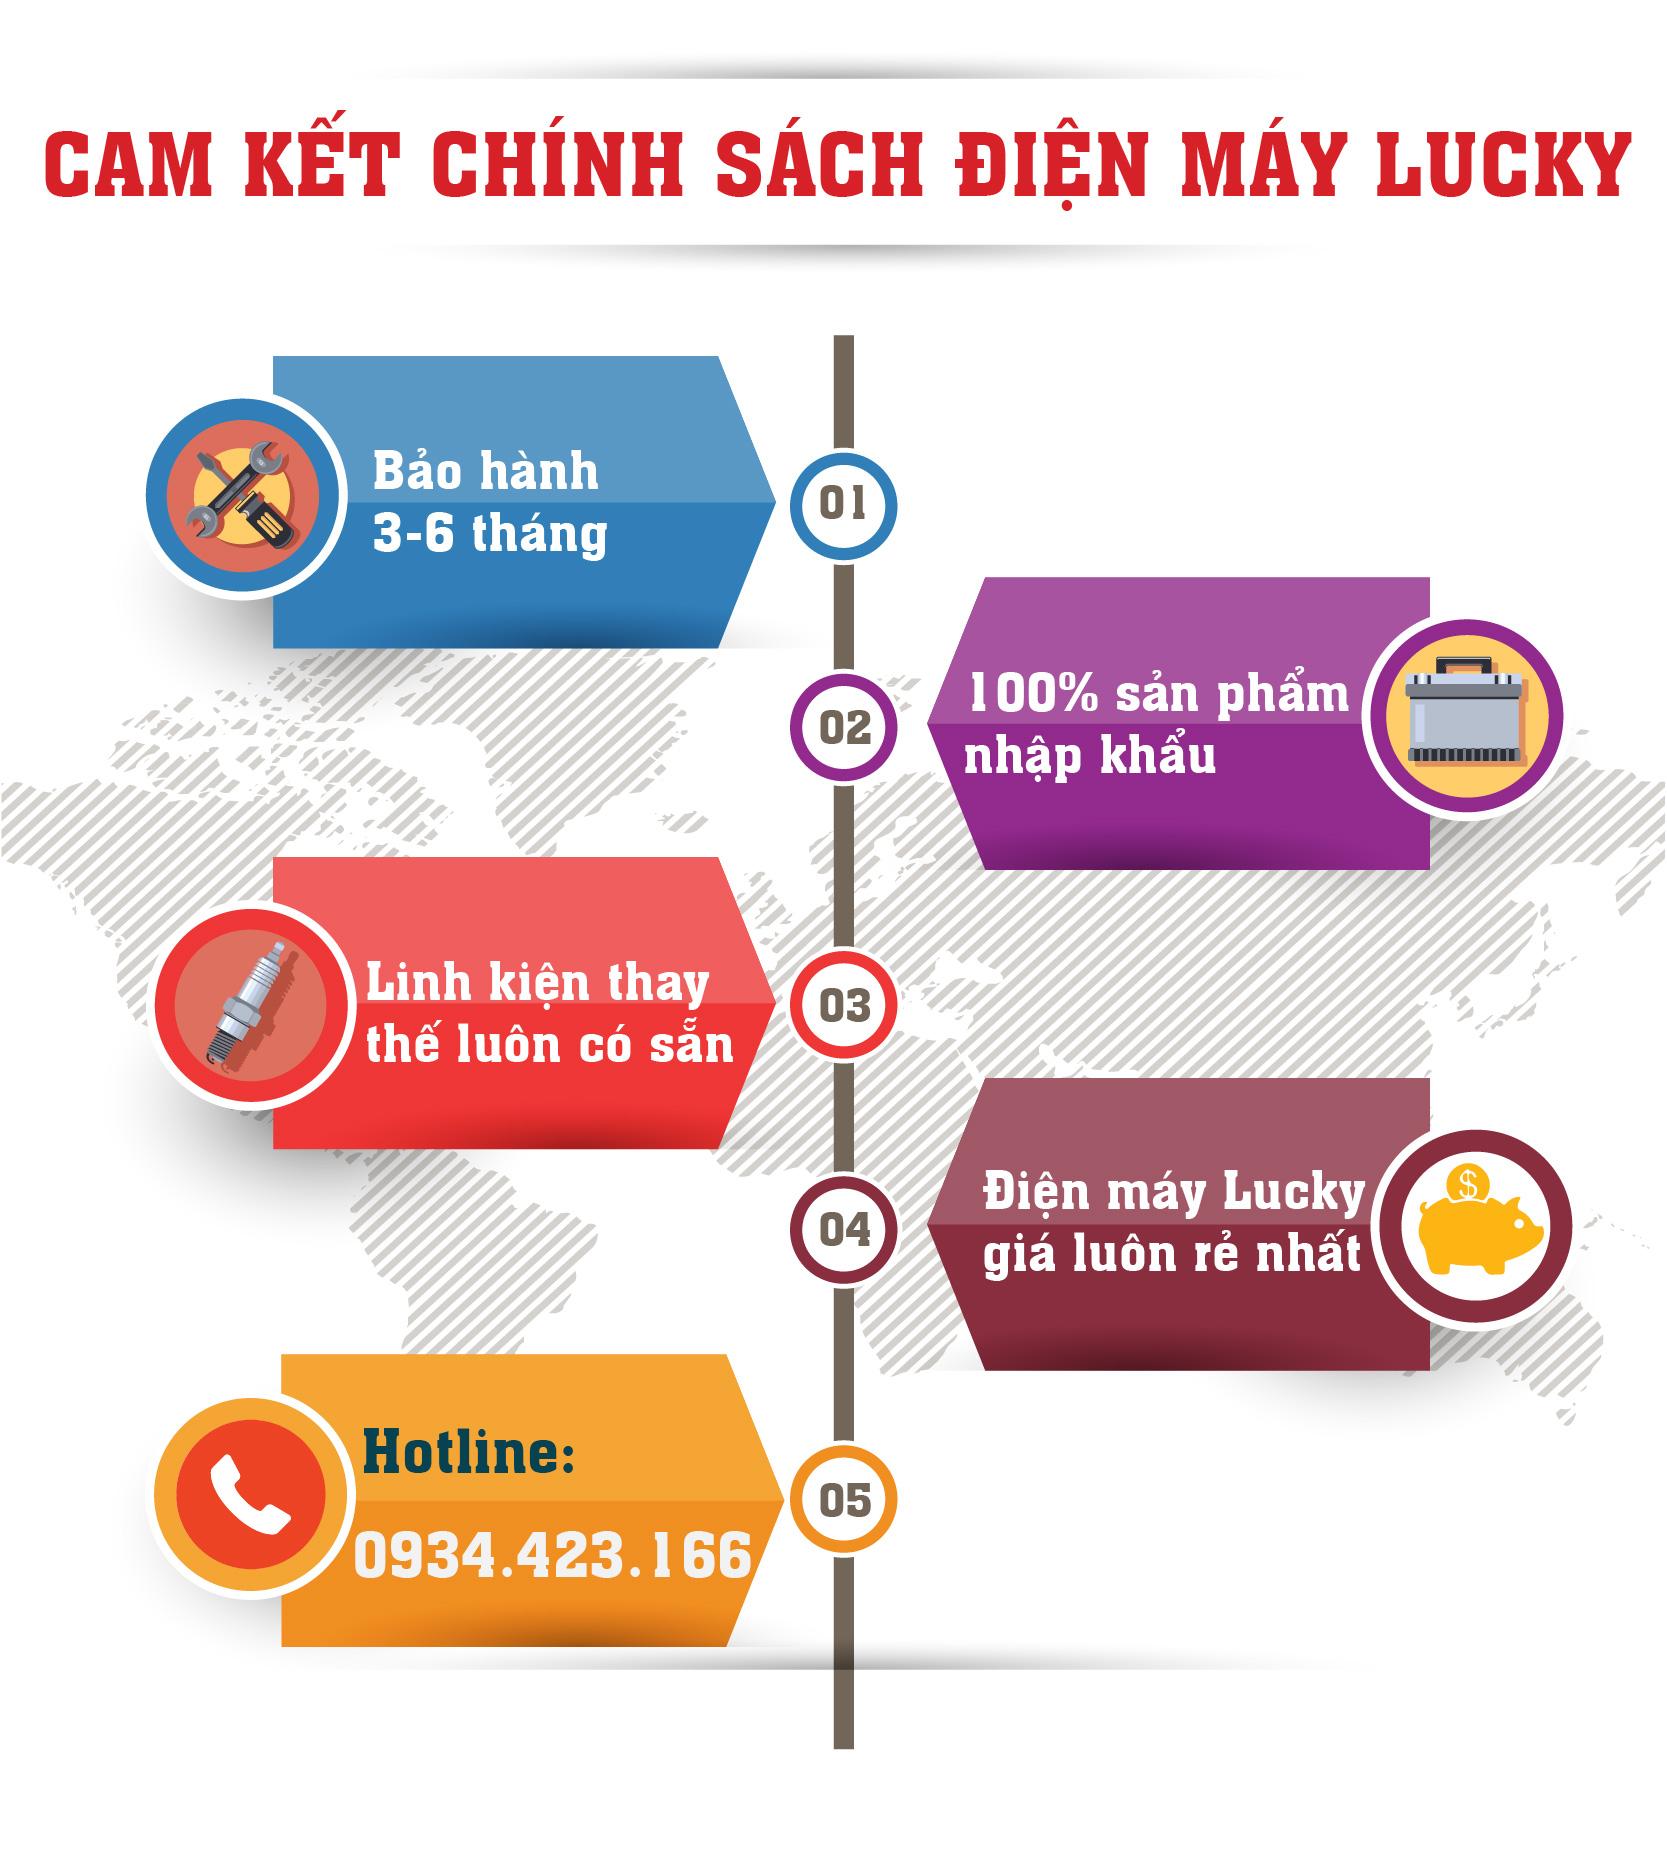 chinh sach bao hanh phu kien-01